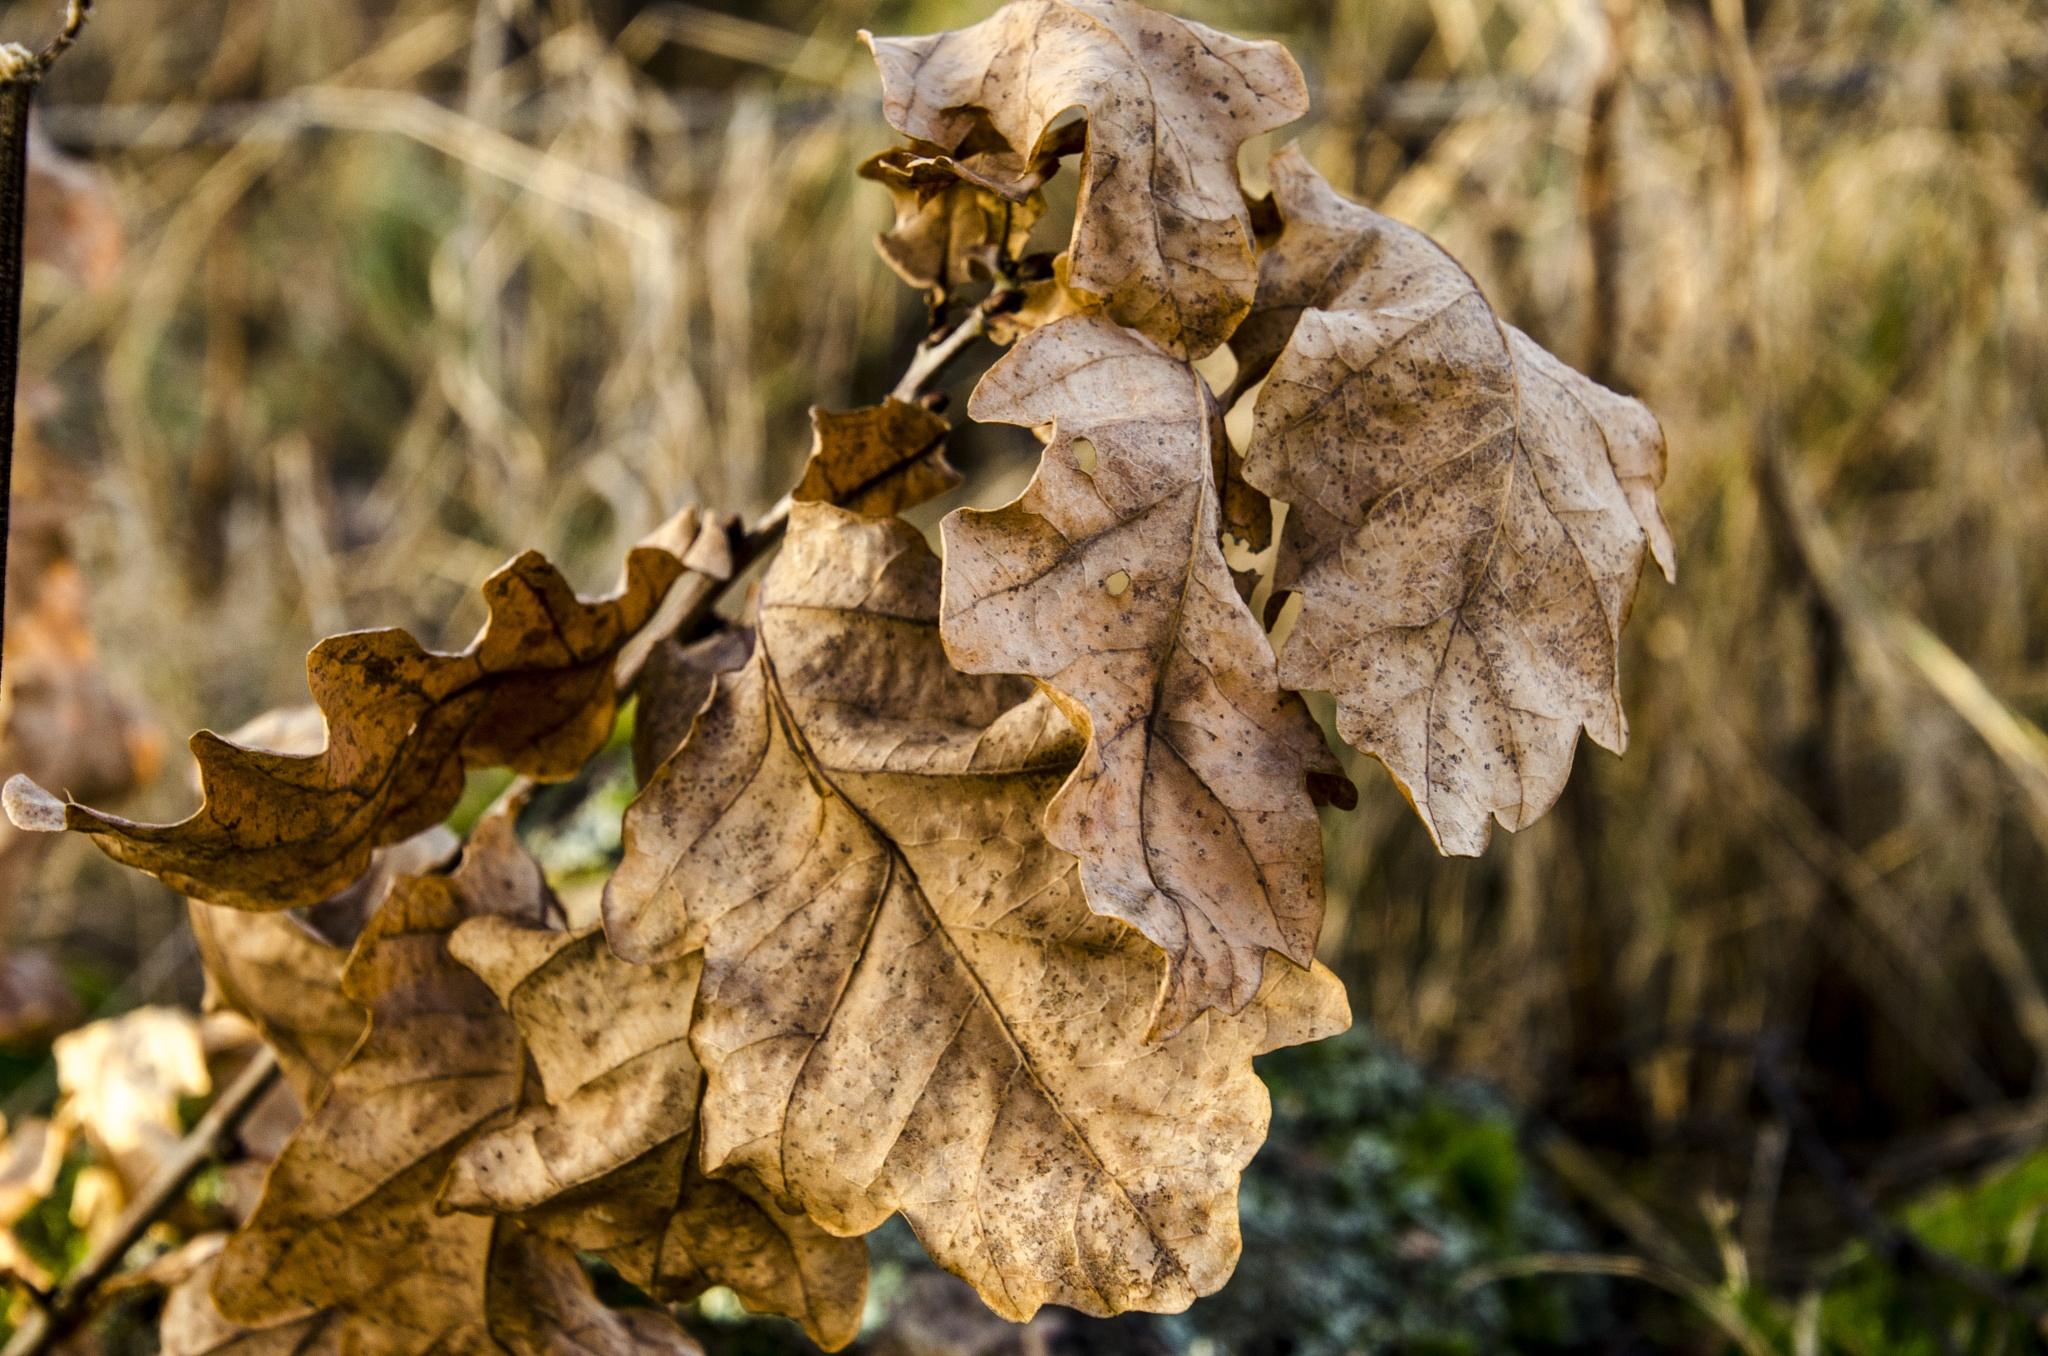 Autumn leaf by Johnny Lythell